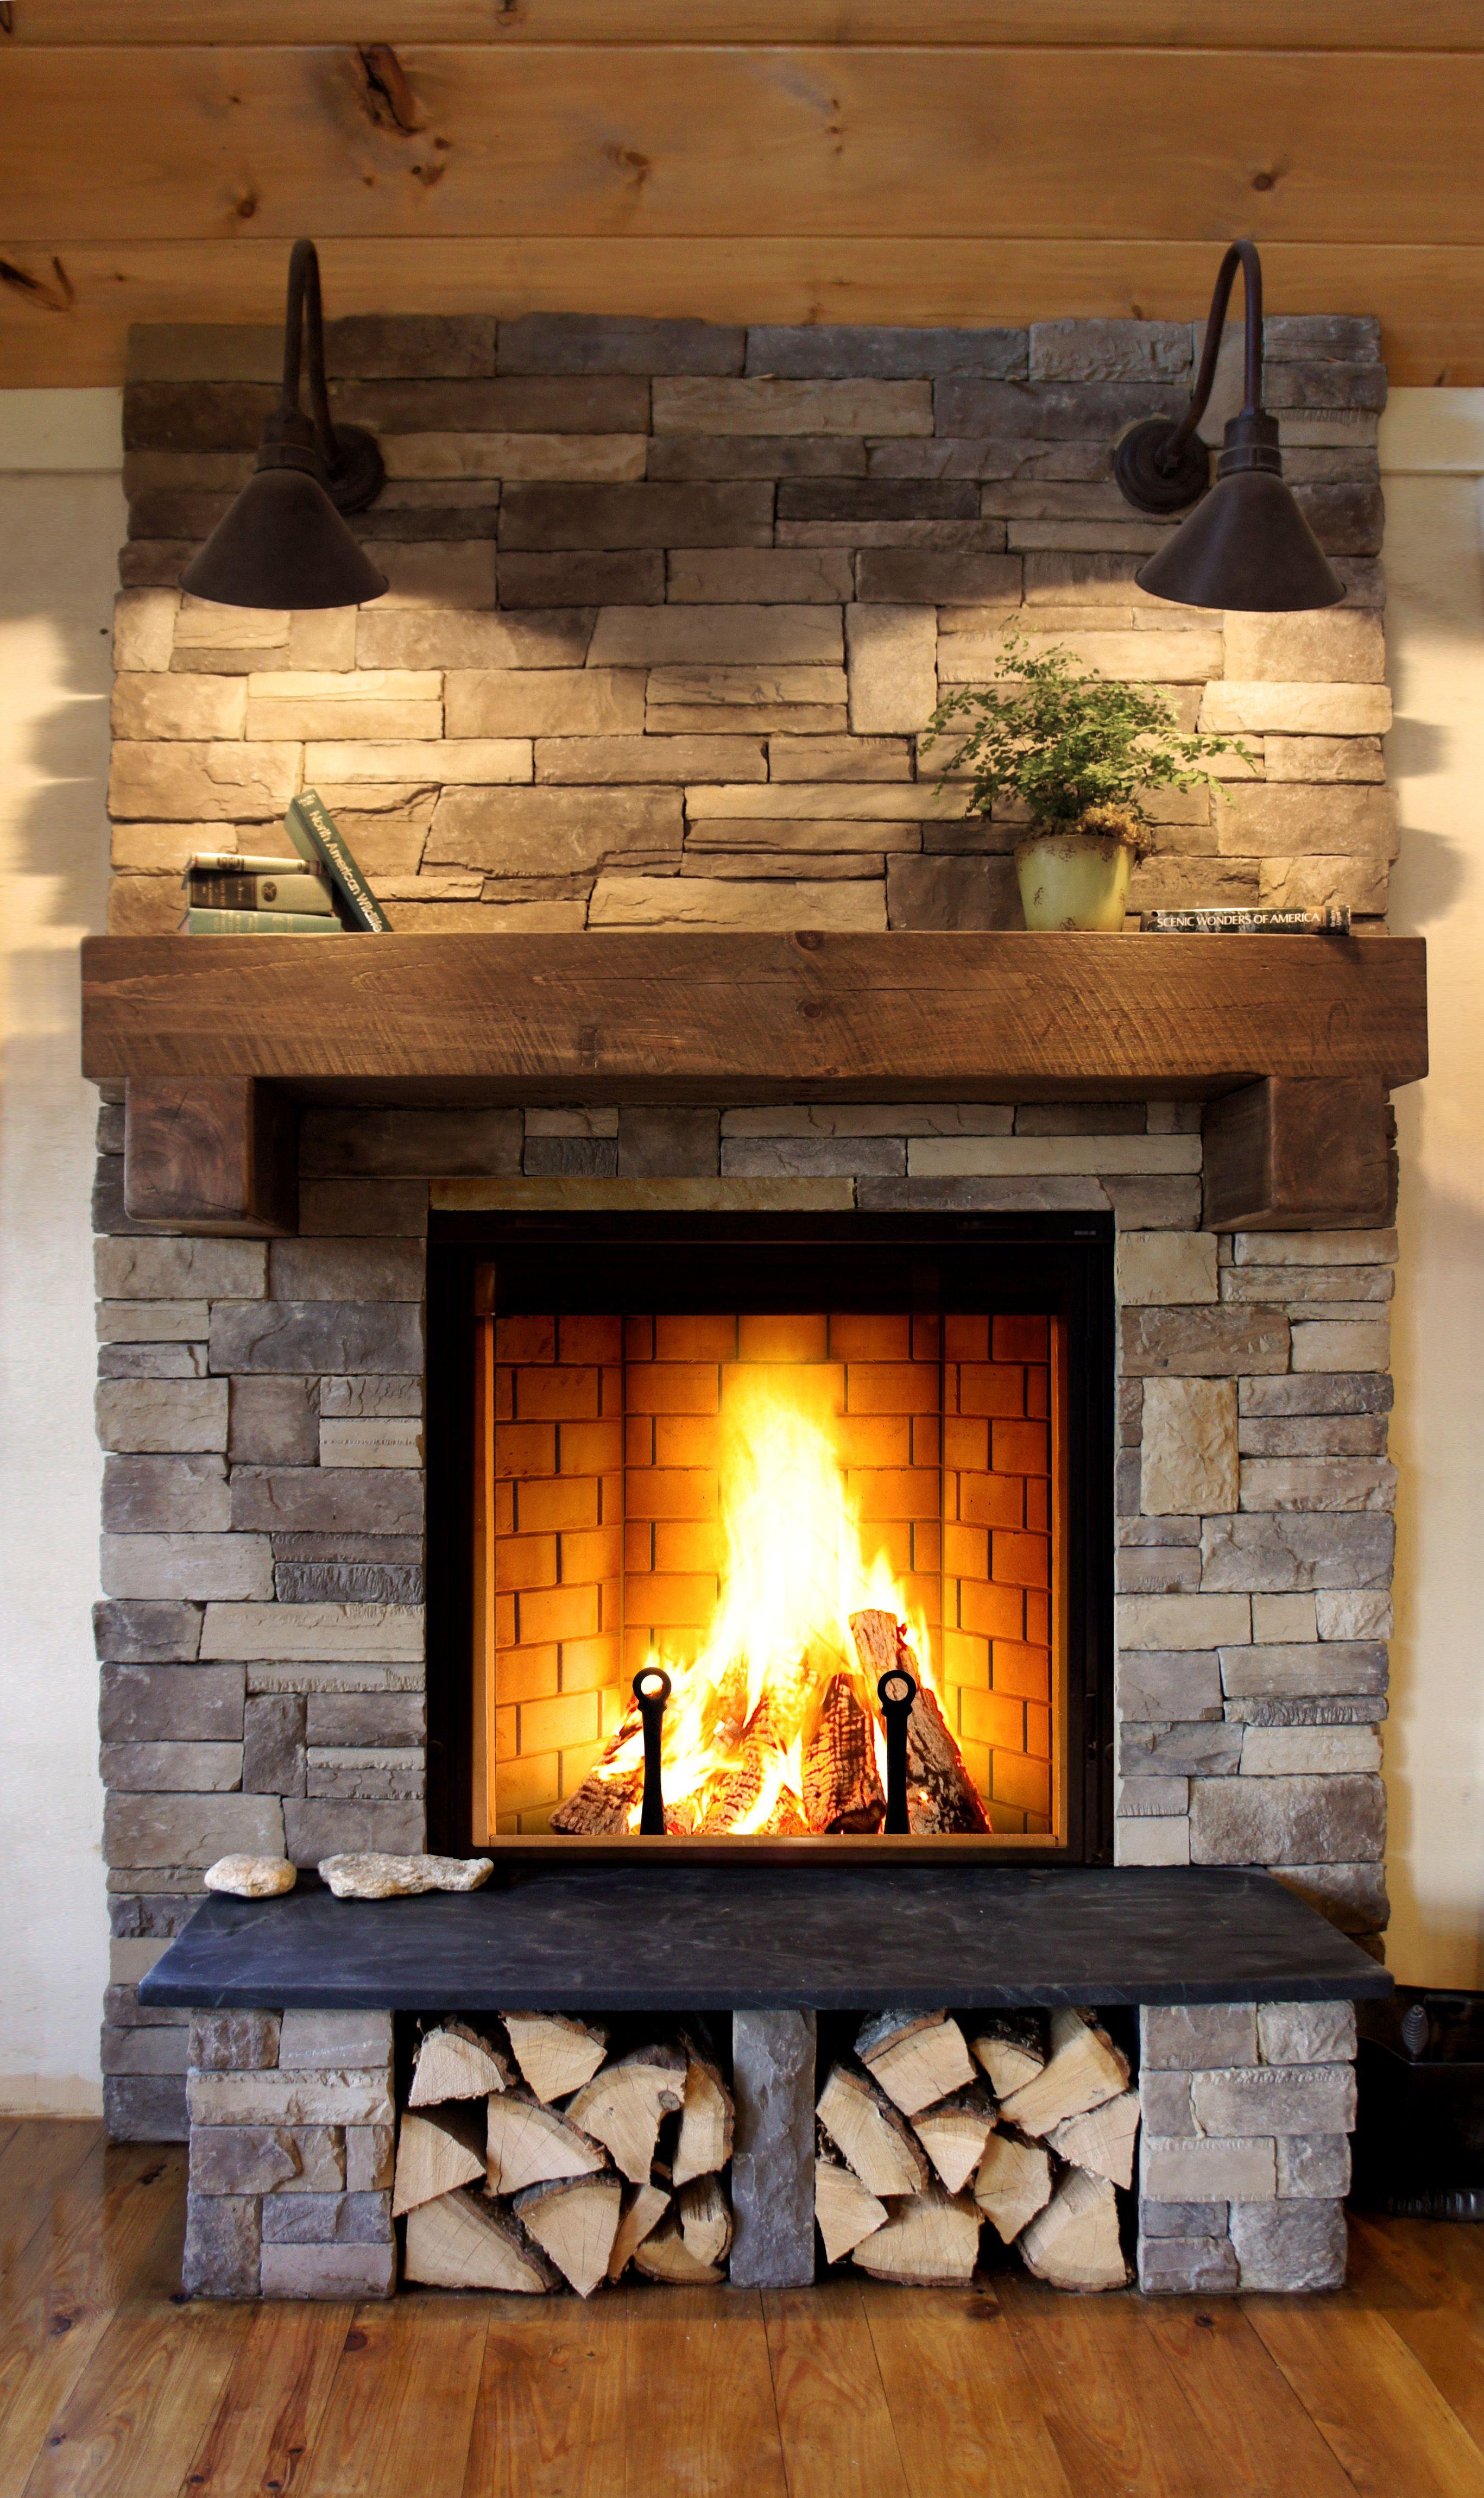 Renaissance Rumford 1500 Has A Breathtaking Fire And A Hidden